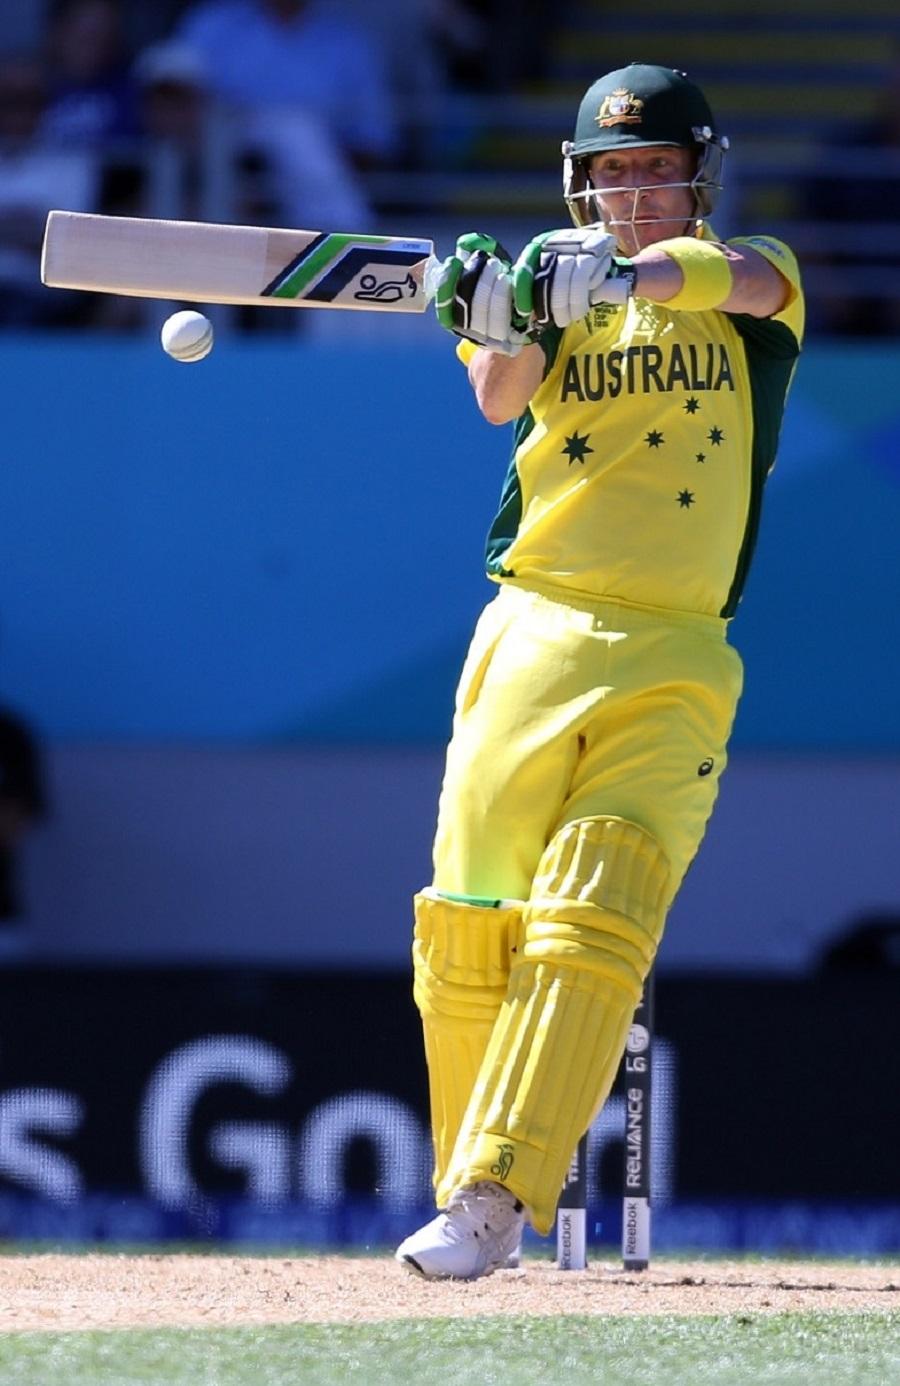 Australia vs Afghanistan Cricket Highlights